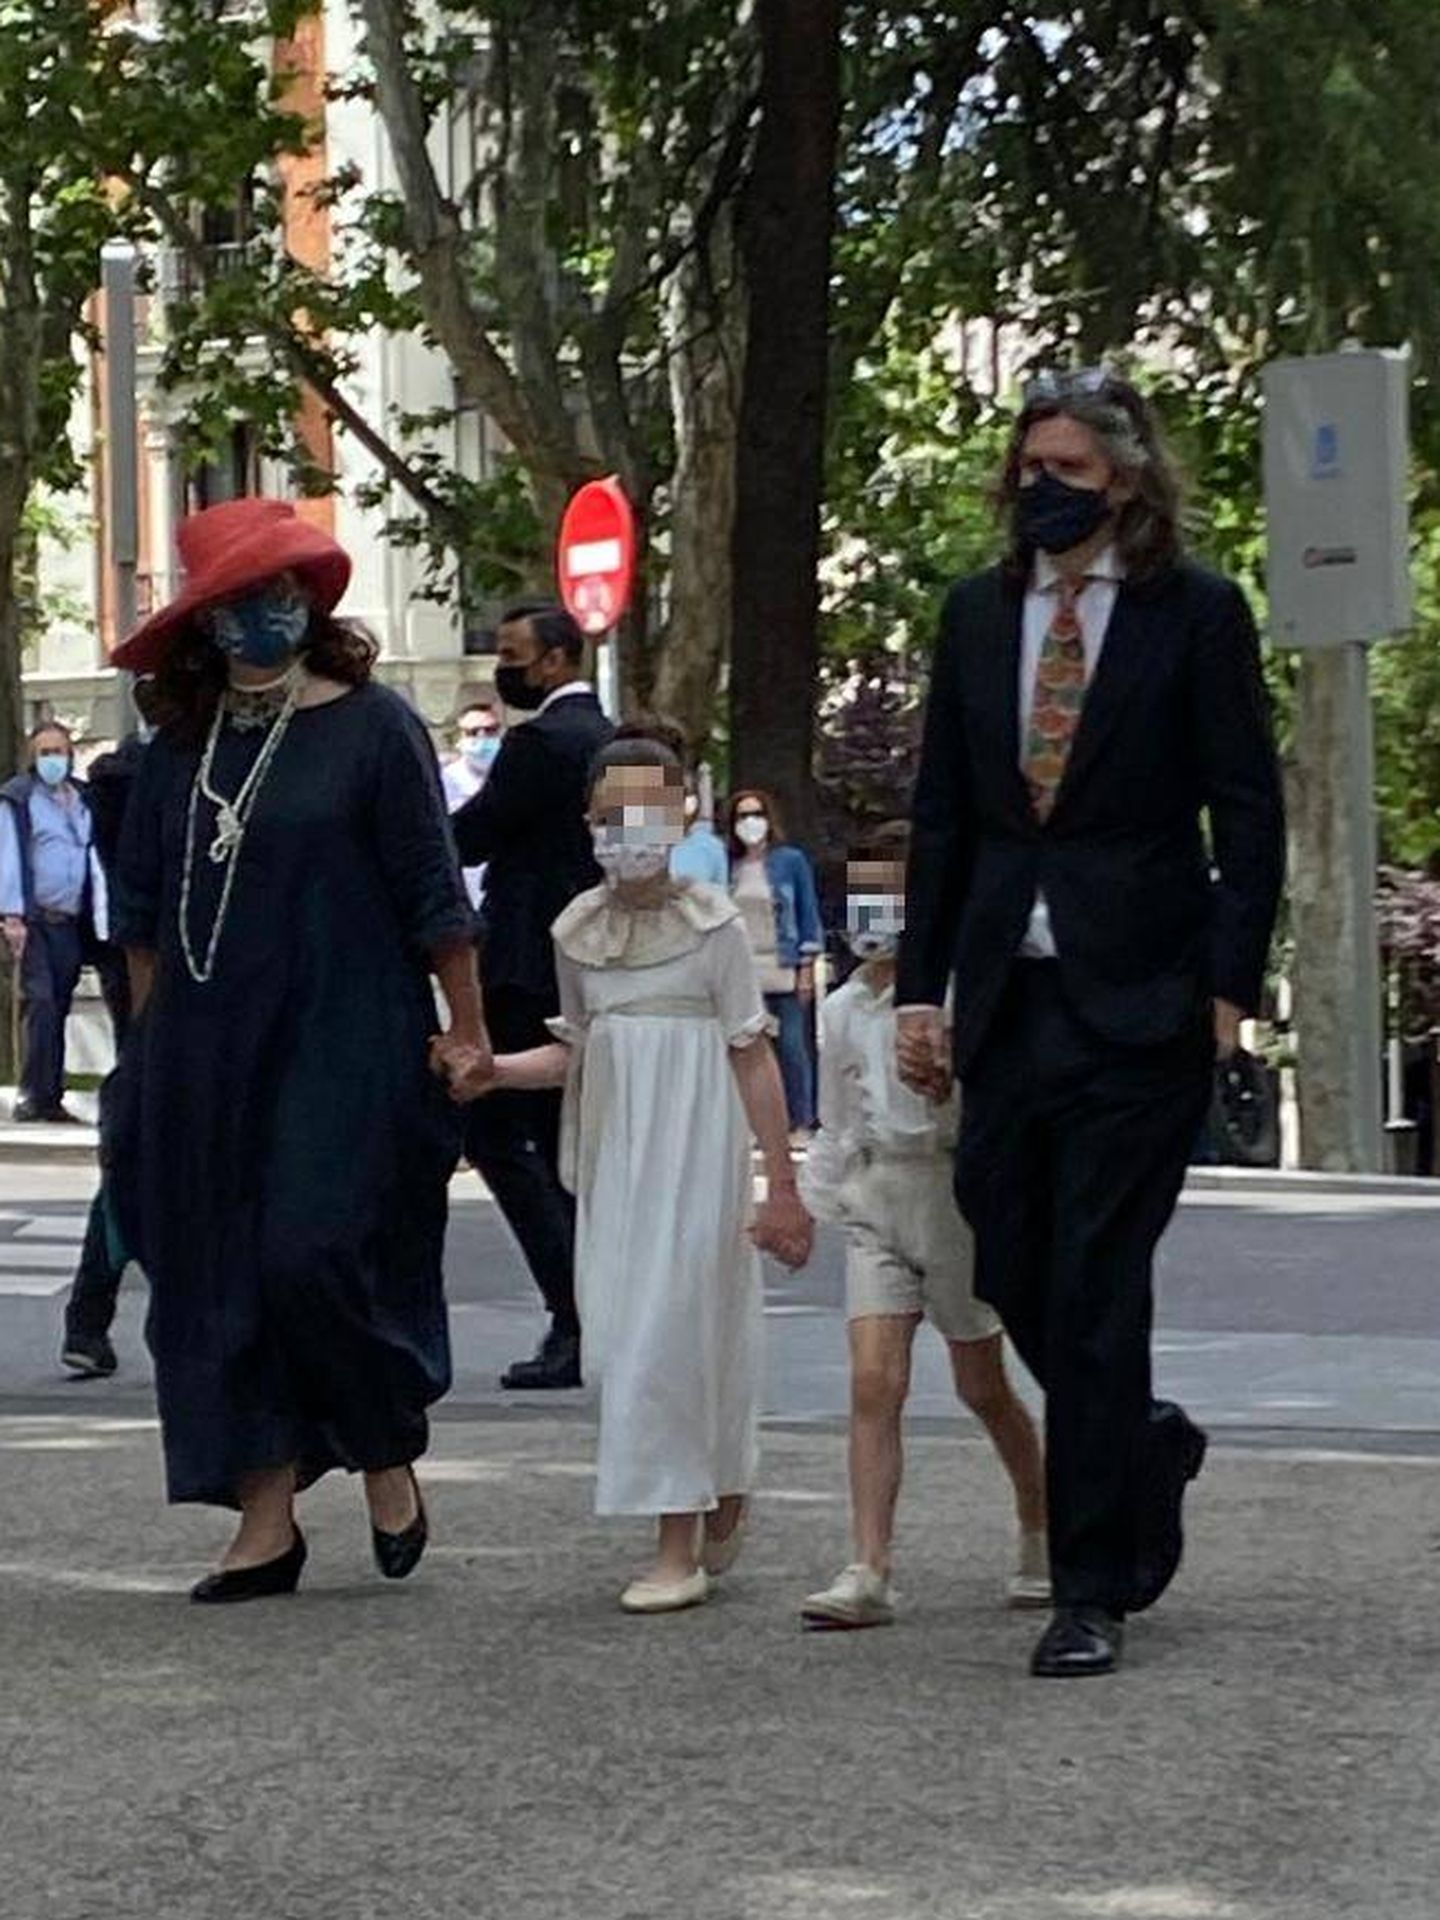 Jacobo Fitz-James y Asela Pérez Becerril, con sus hijos. (P.I.)